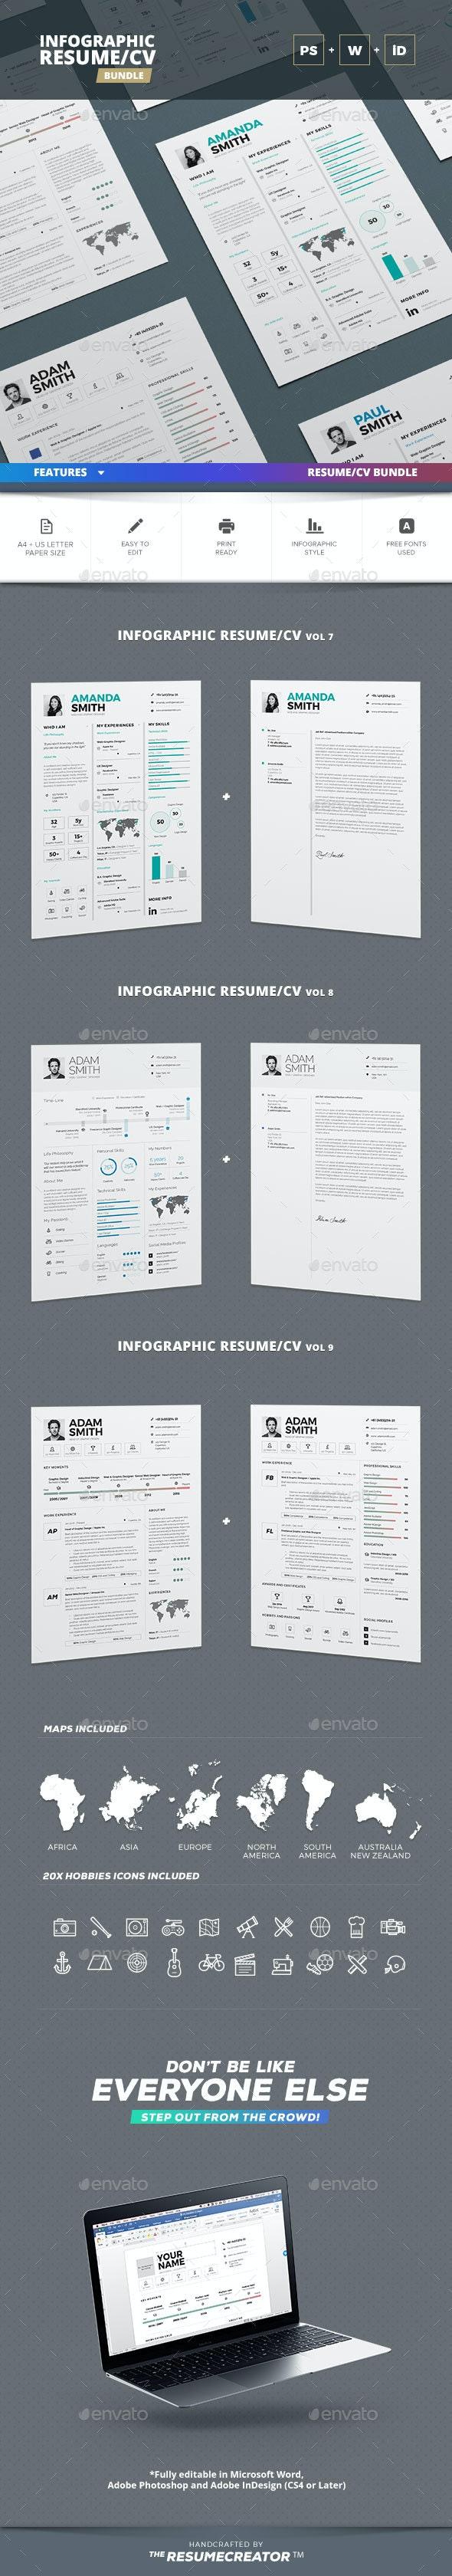 Infographic Resume/Cv Bundle Volume 2 - Resumes Stationery